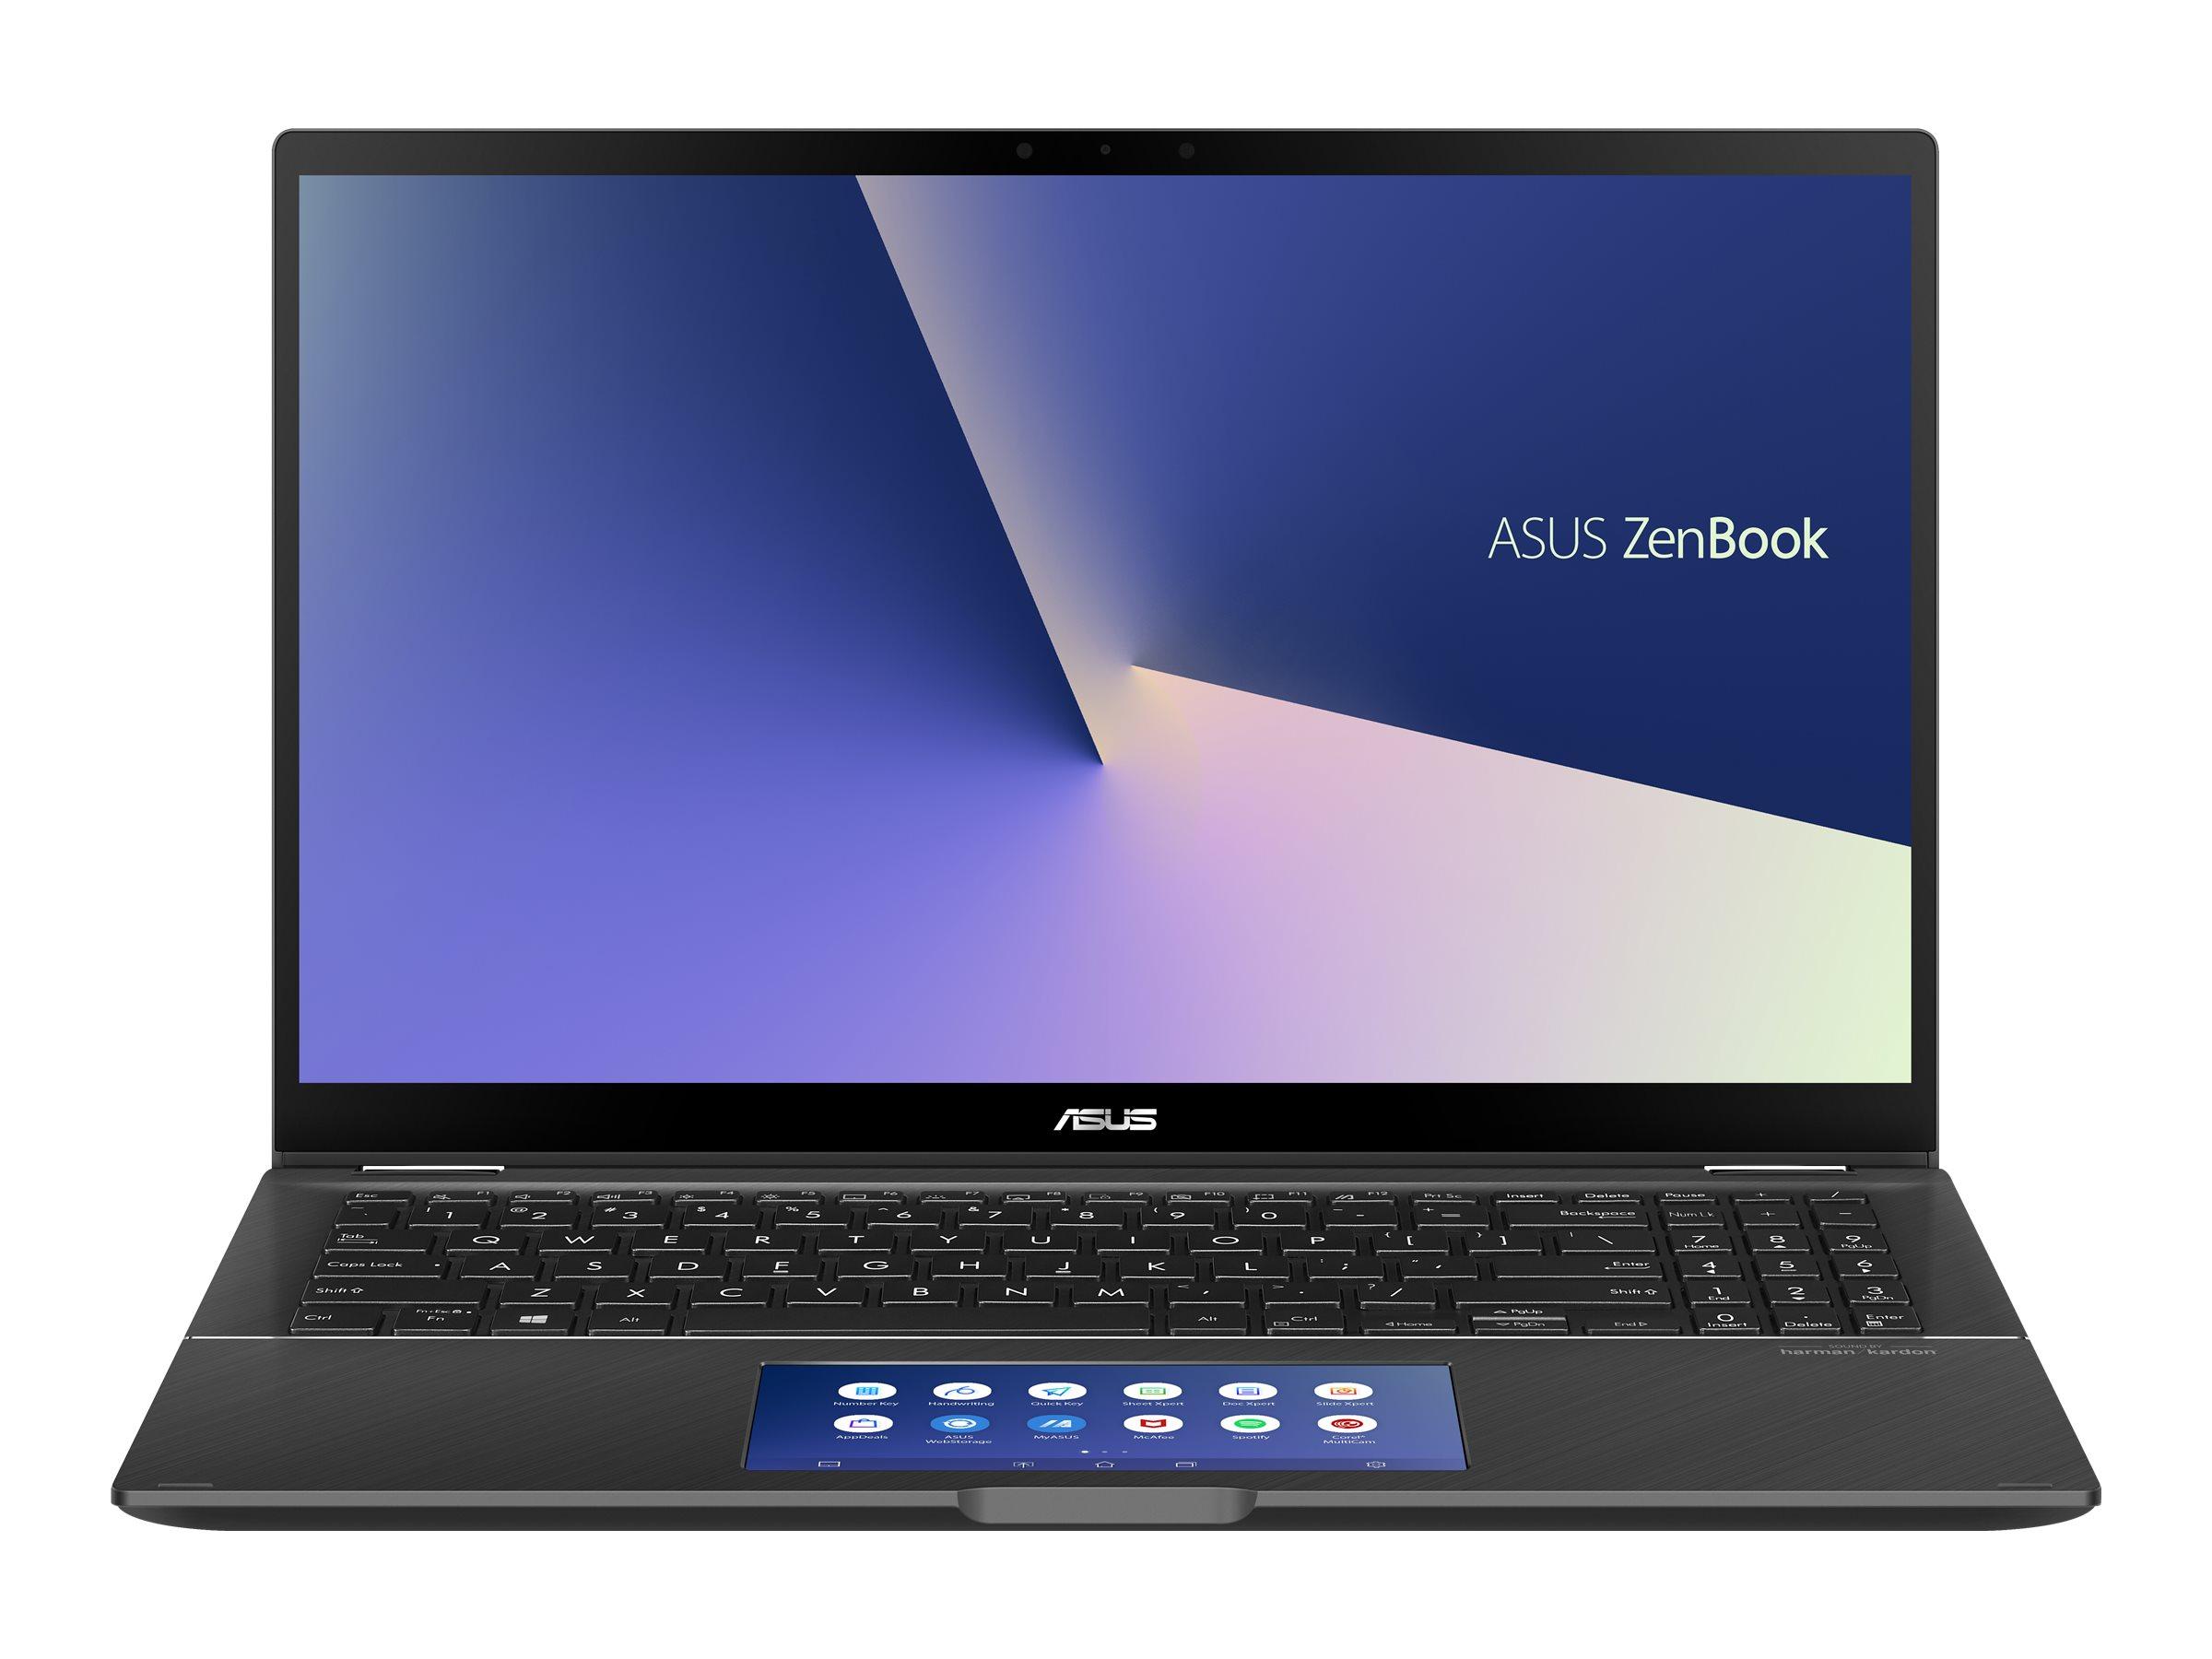 "ASUS ZenBook Flip 15 UX563FD-A1027R - Flip-Design - Core i7 10510U / 1.8 GHz - Win 10 Pro 64-Bit - 16 GB RAM - 1 TB SSD NVMe - 39.6 cm (15.6"")"